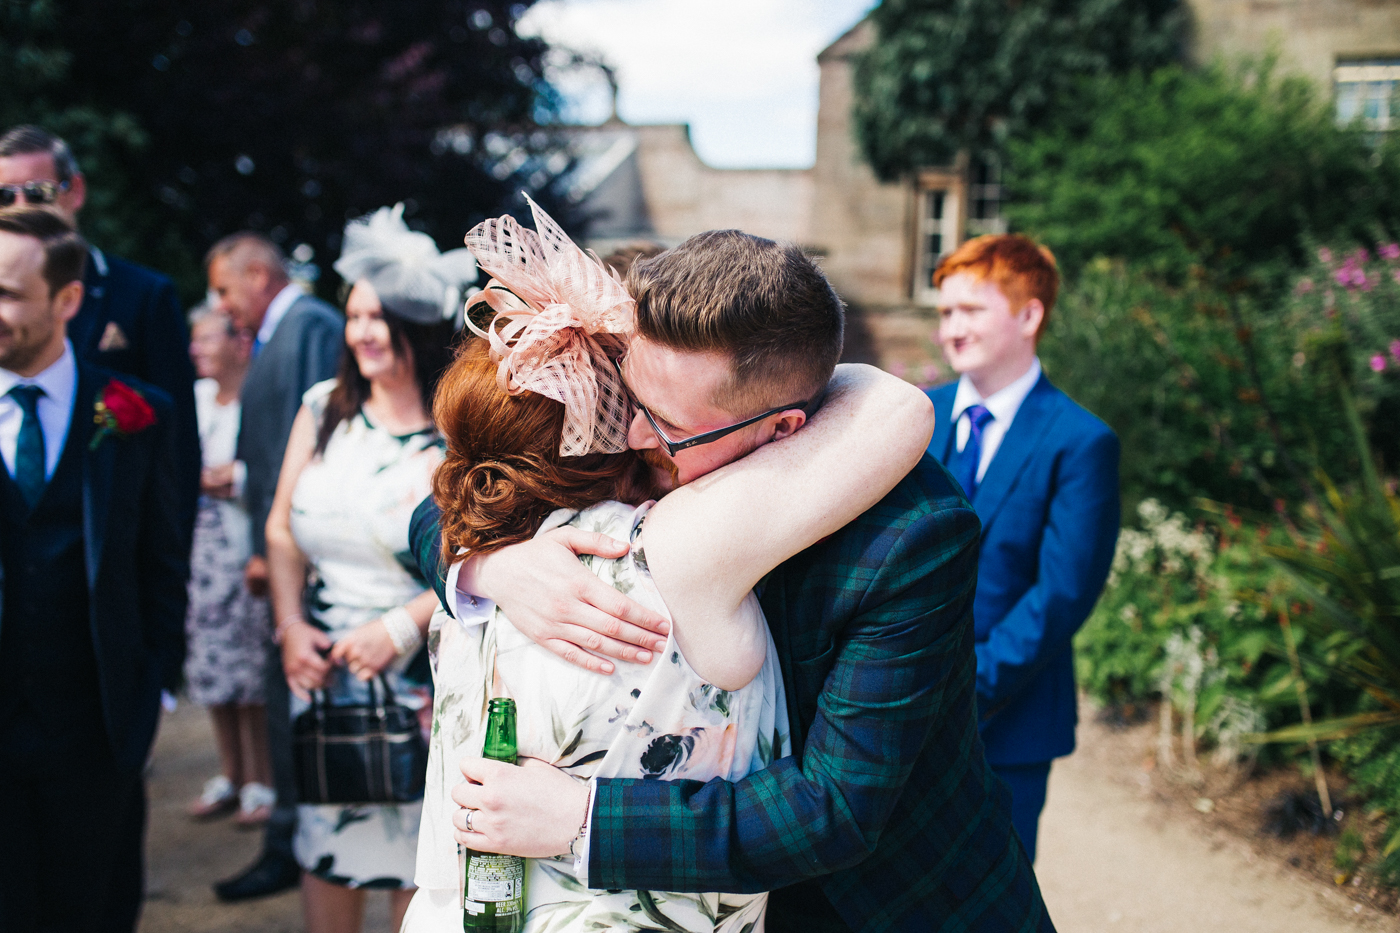 teesside-middlesbrough-north-east-wedding-photographer-creative-wedding-venues-0049.jpg